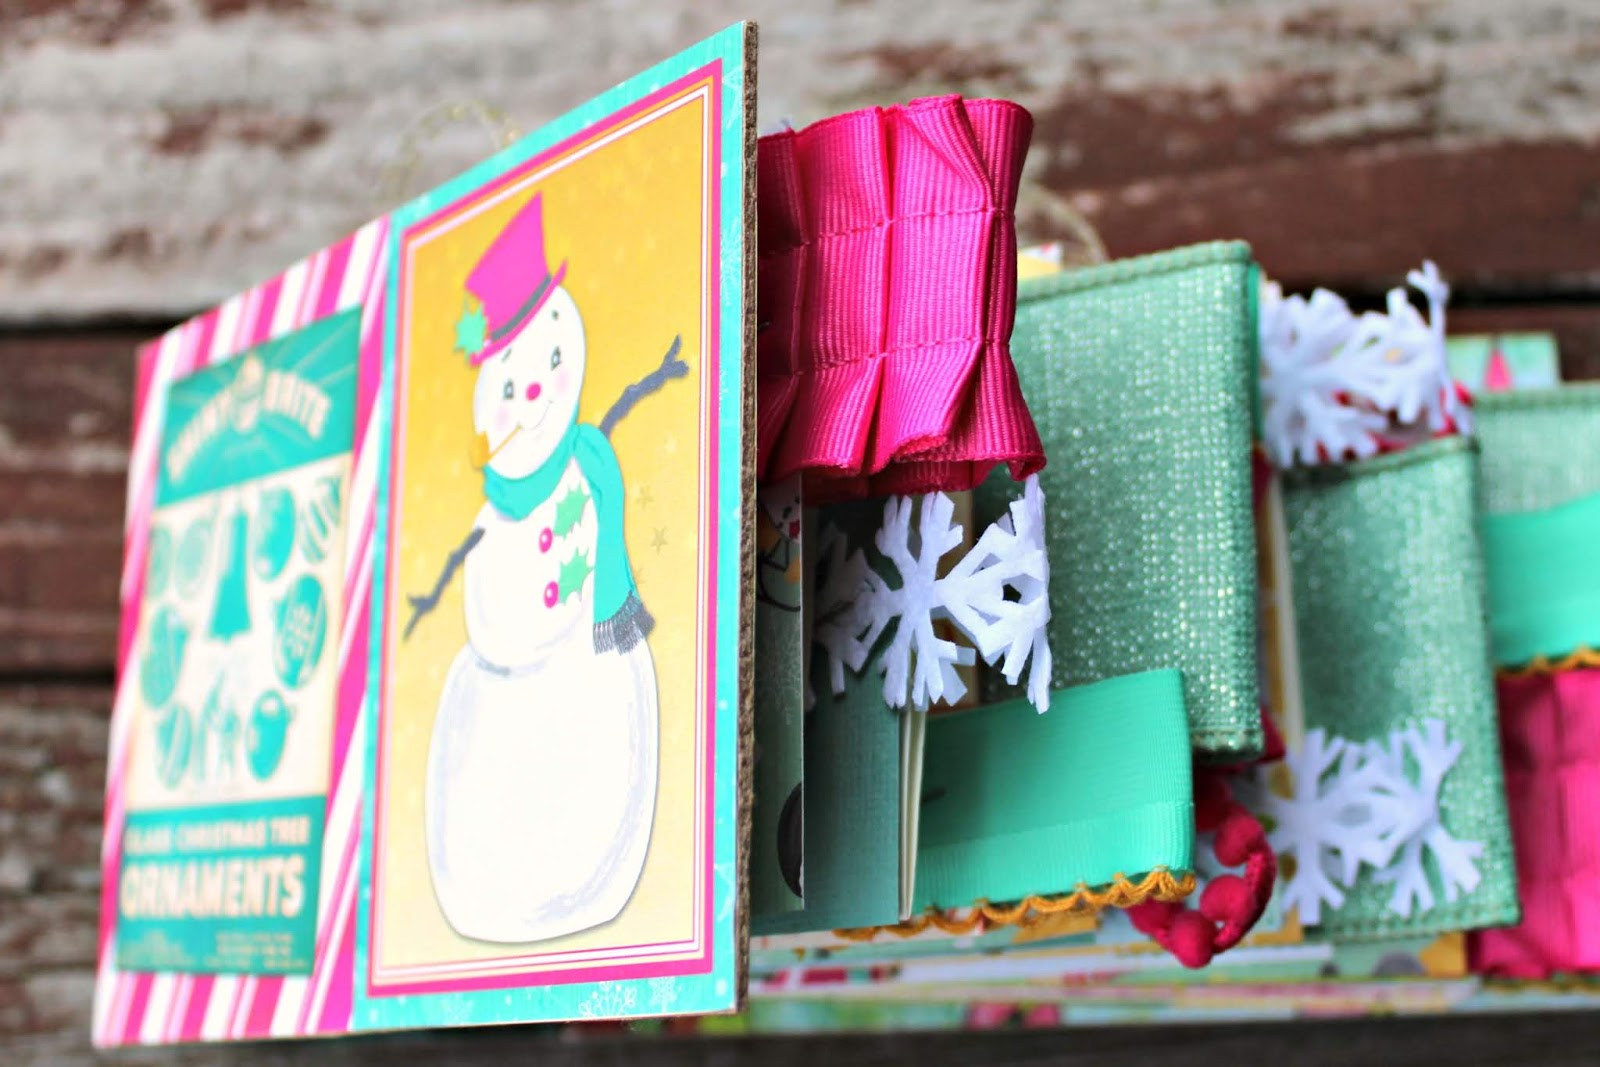 December Caravan Etsy Shop - Caravan Sonnet Blog